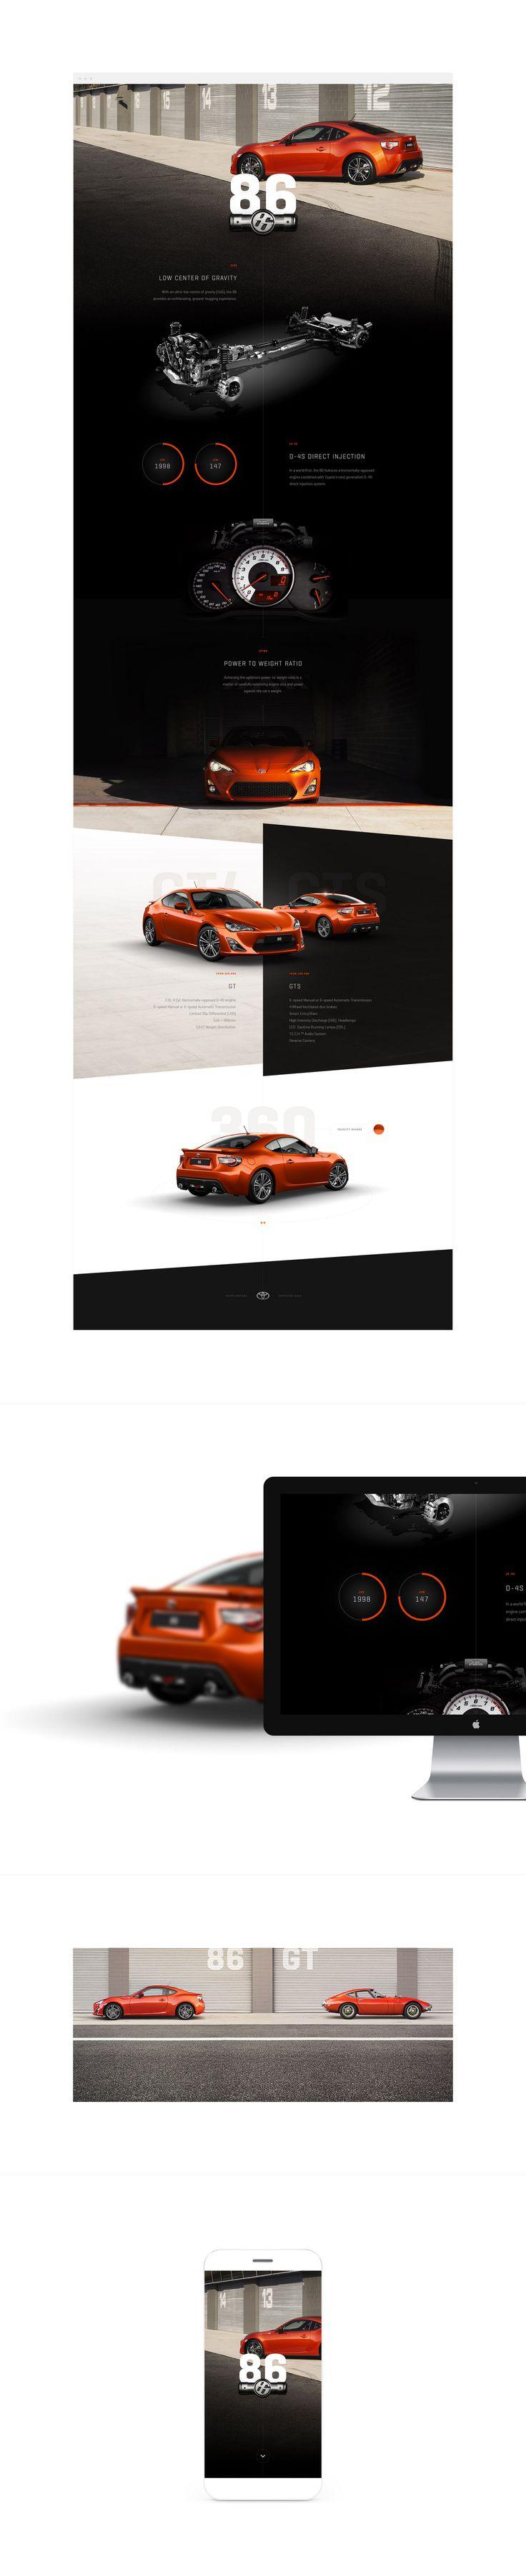 Toyota 86 Web Design, Website UX / UI - Twofold.com